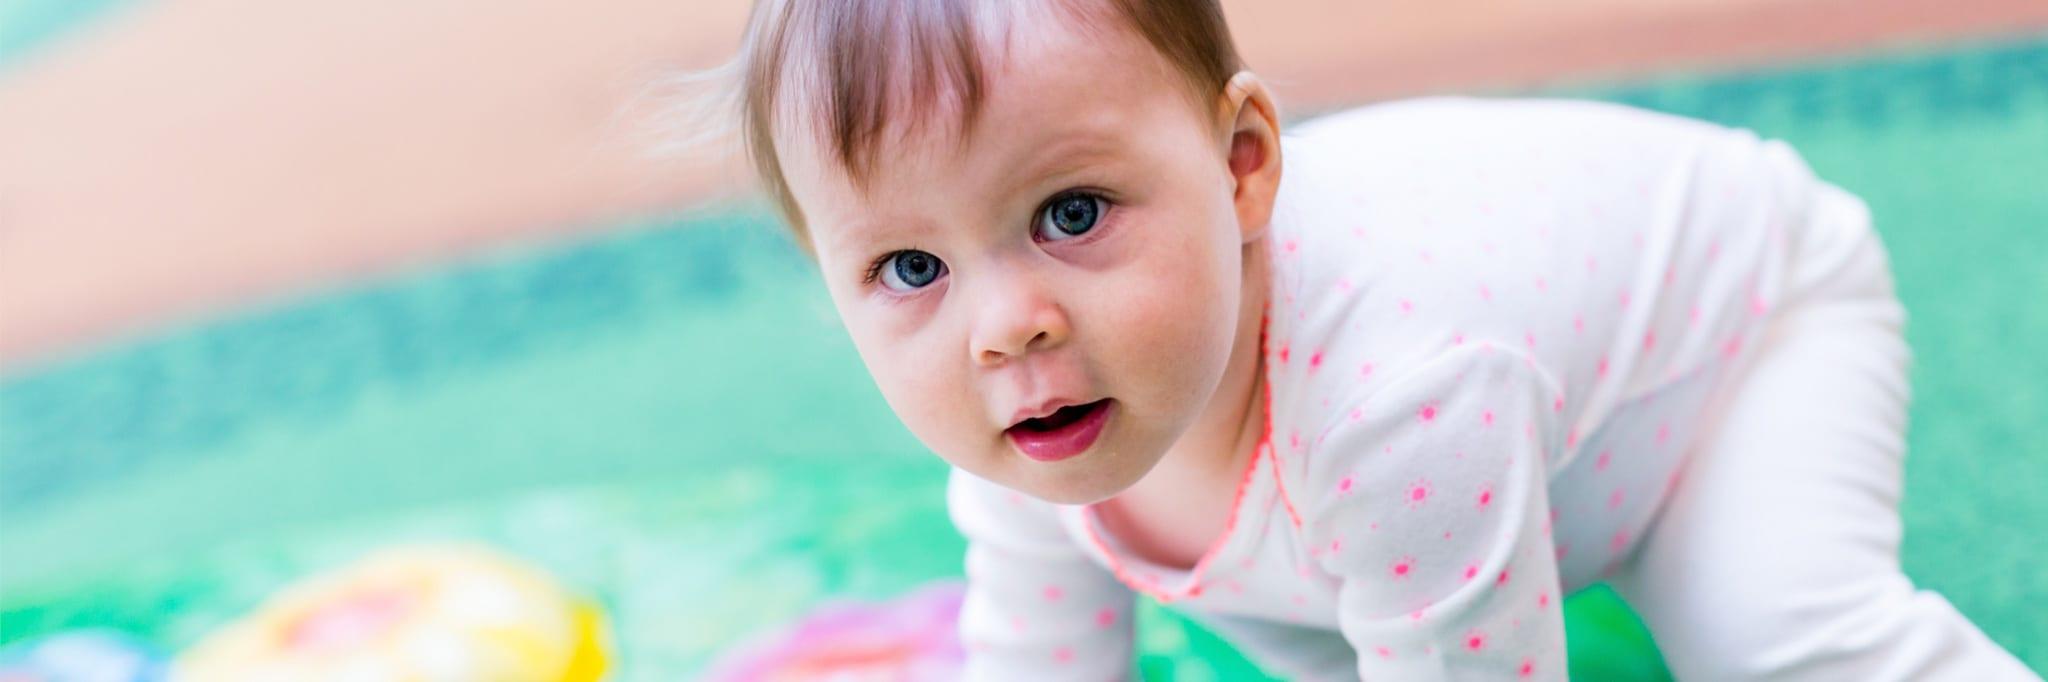 infant at preschool exploring their surroundings